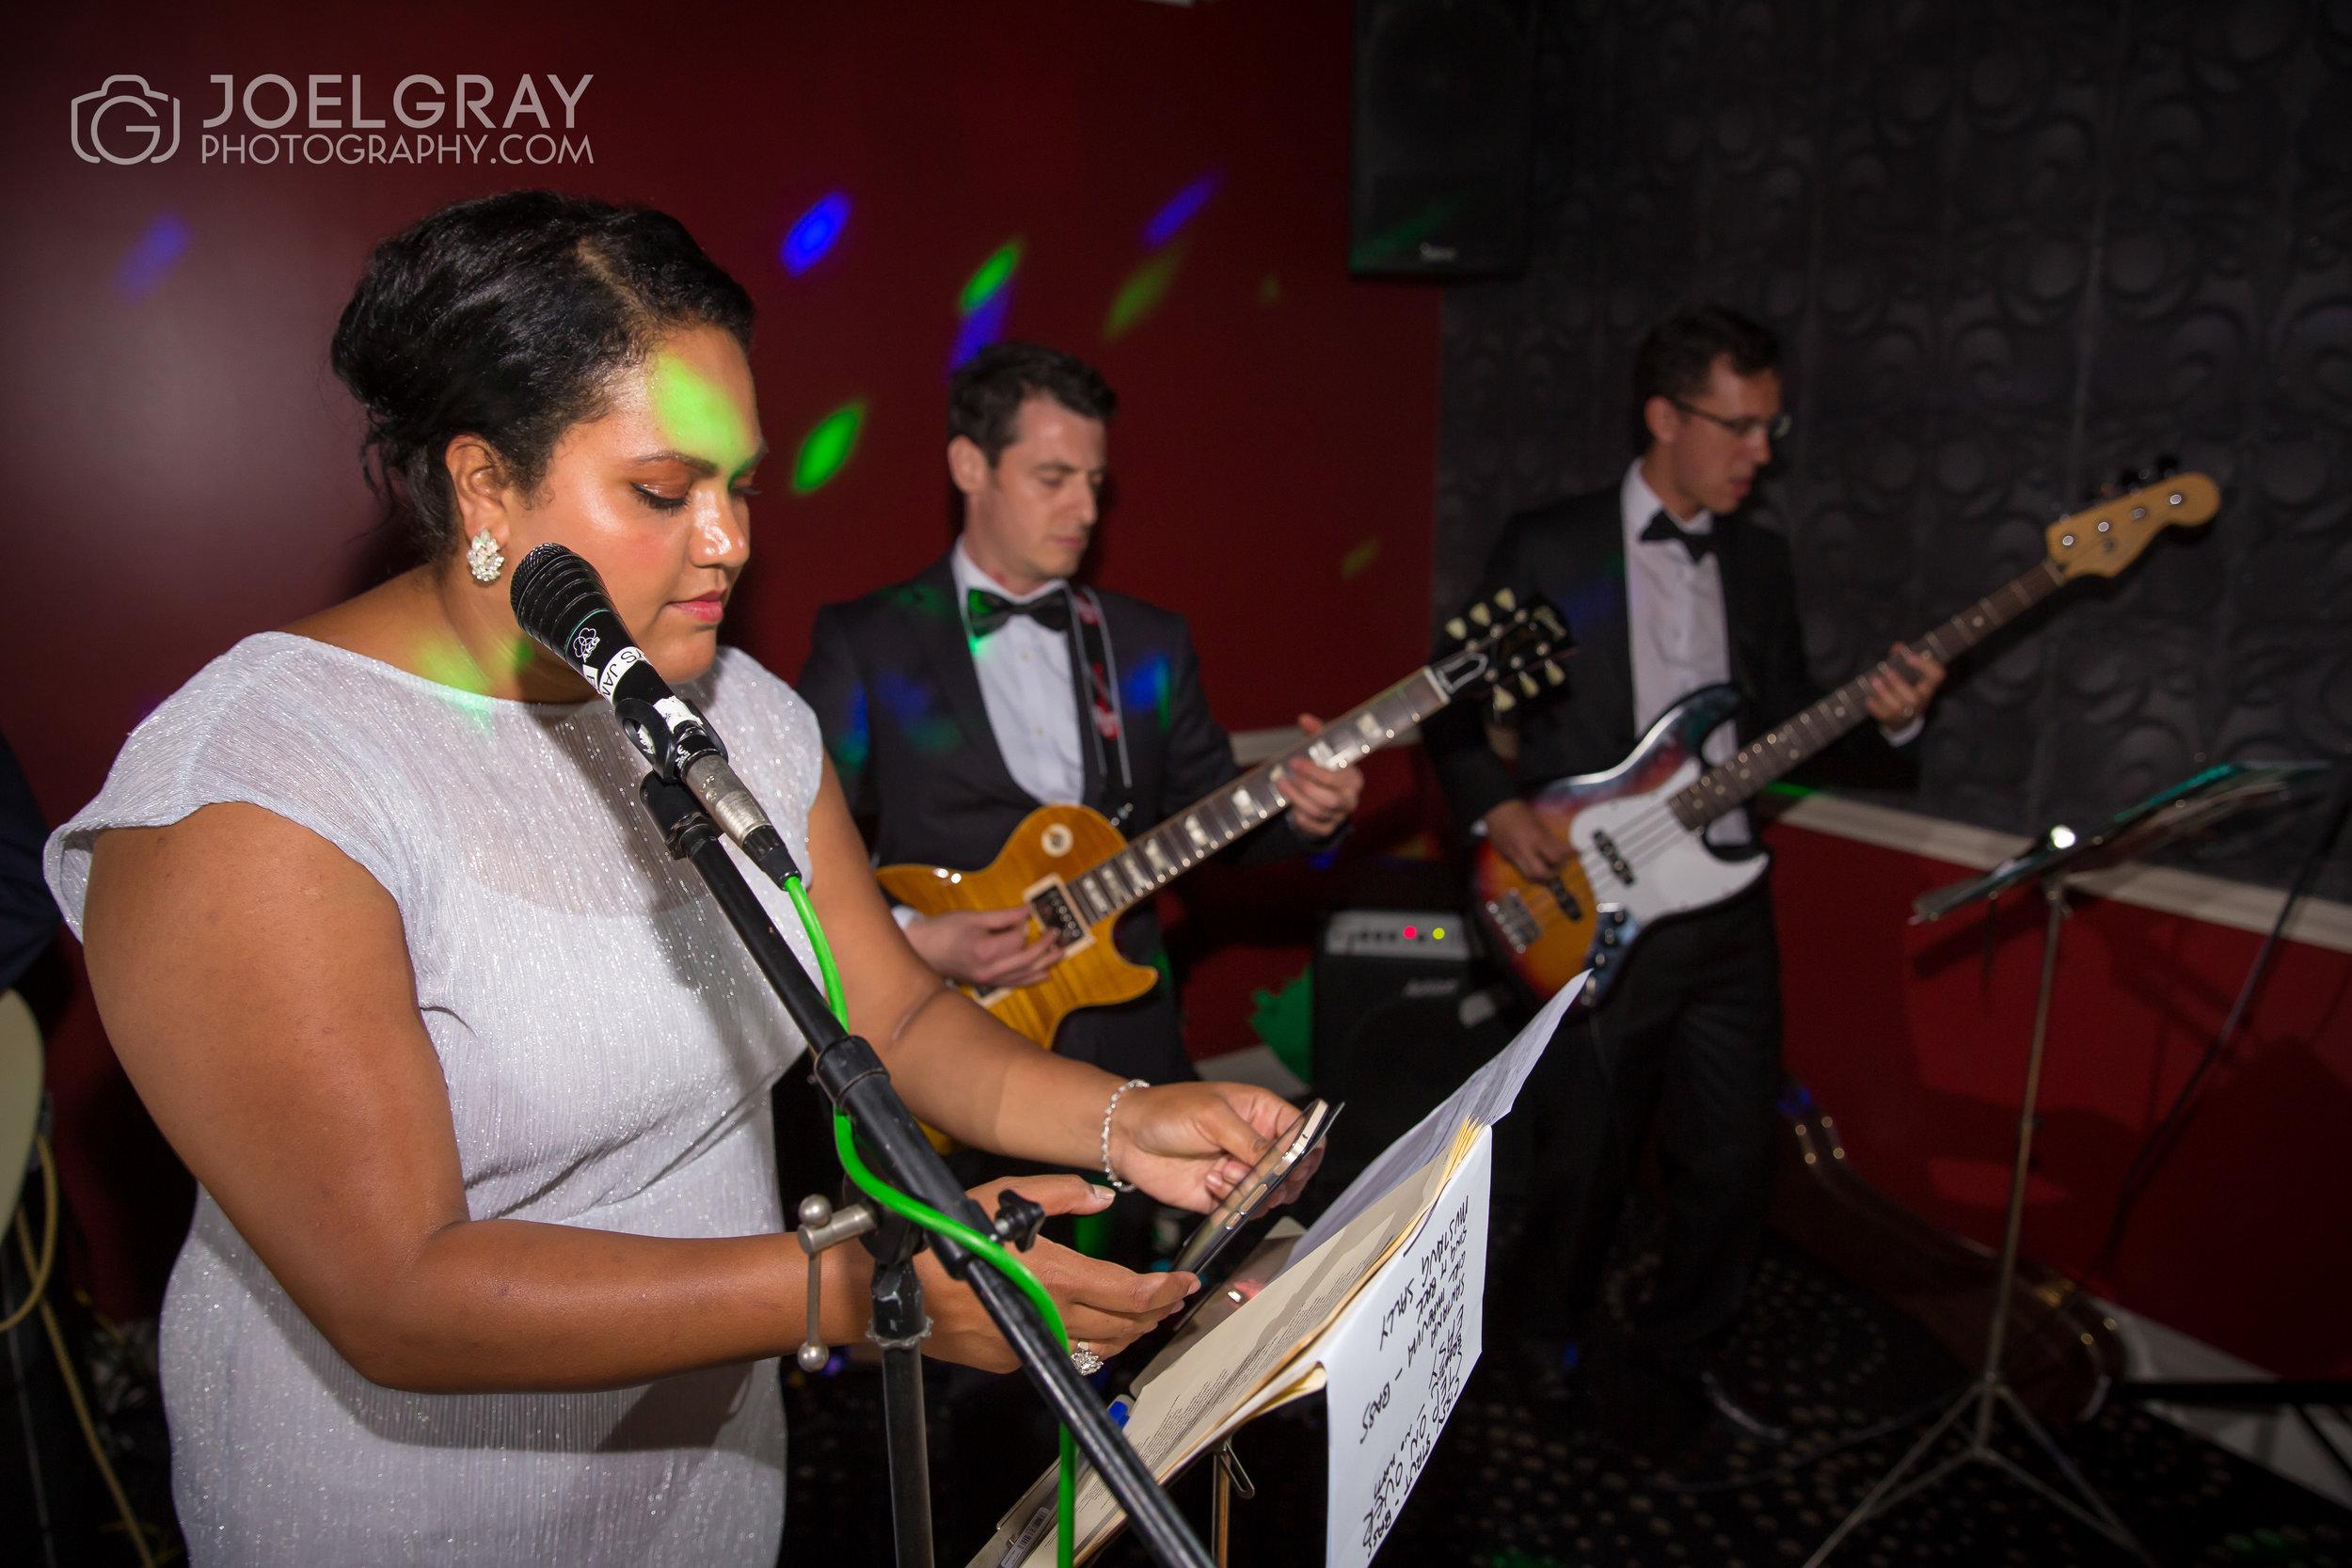 live-music-event-photographer-sydney-1800829994